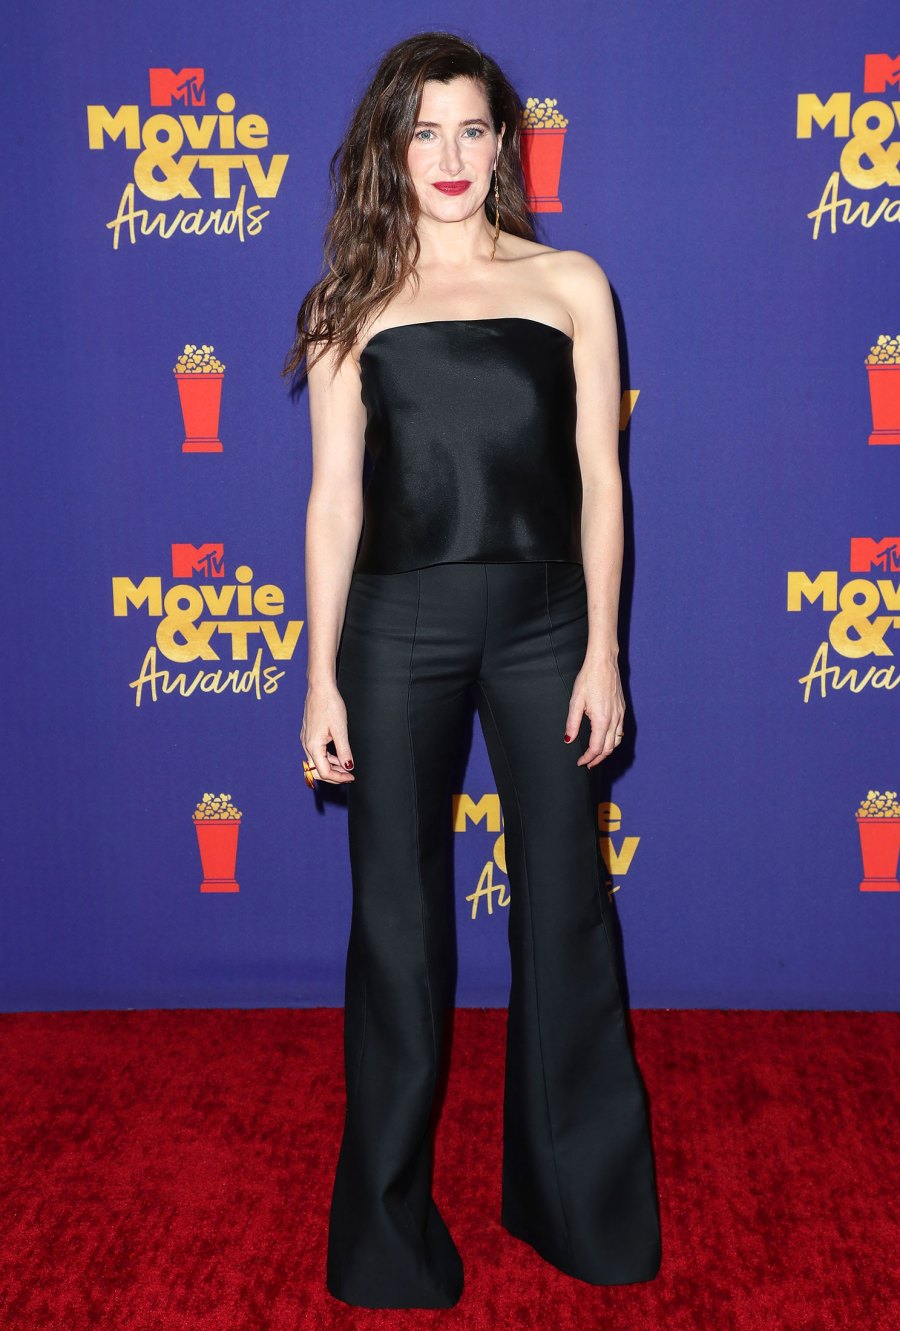 MTV Movie & TV Awards Red Carpet Arrivals - Kathryn Hahn